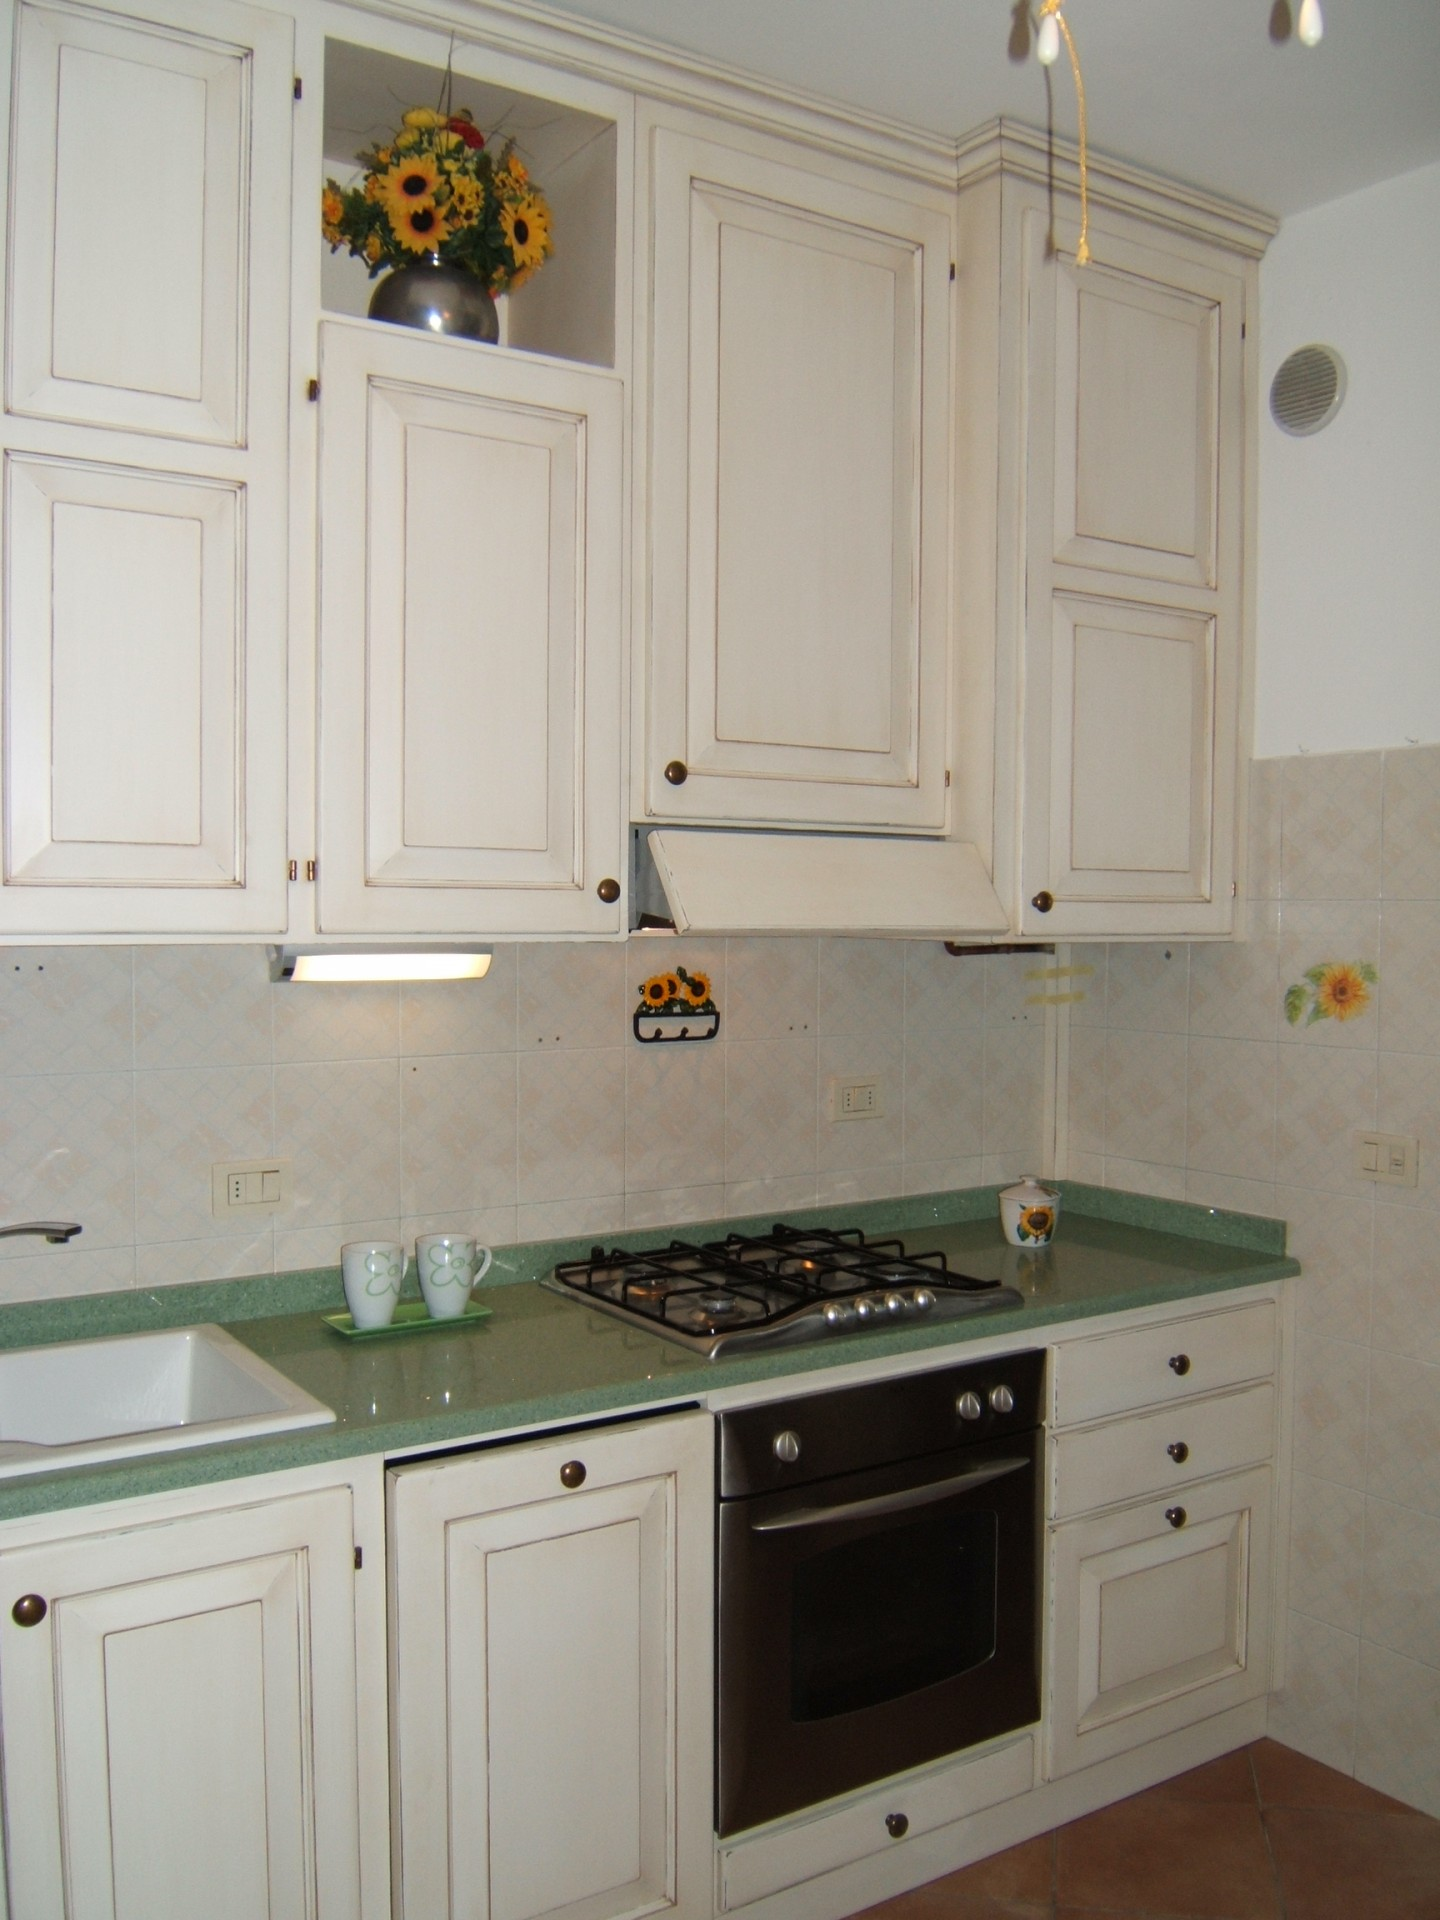 Cucina in muratura fadini mobili cerea verona - Altezza top cucina ...